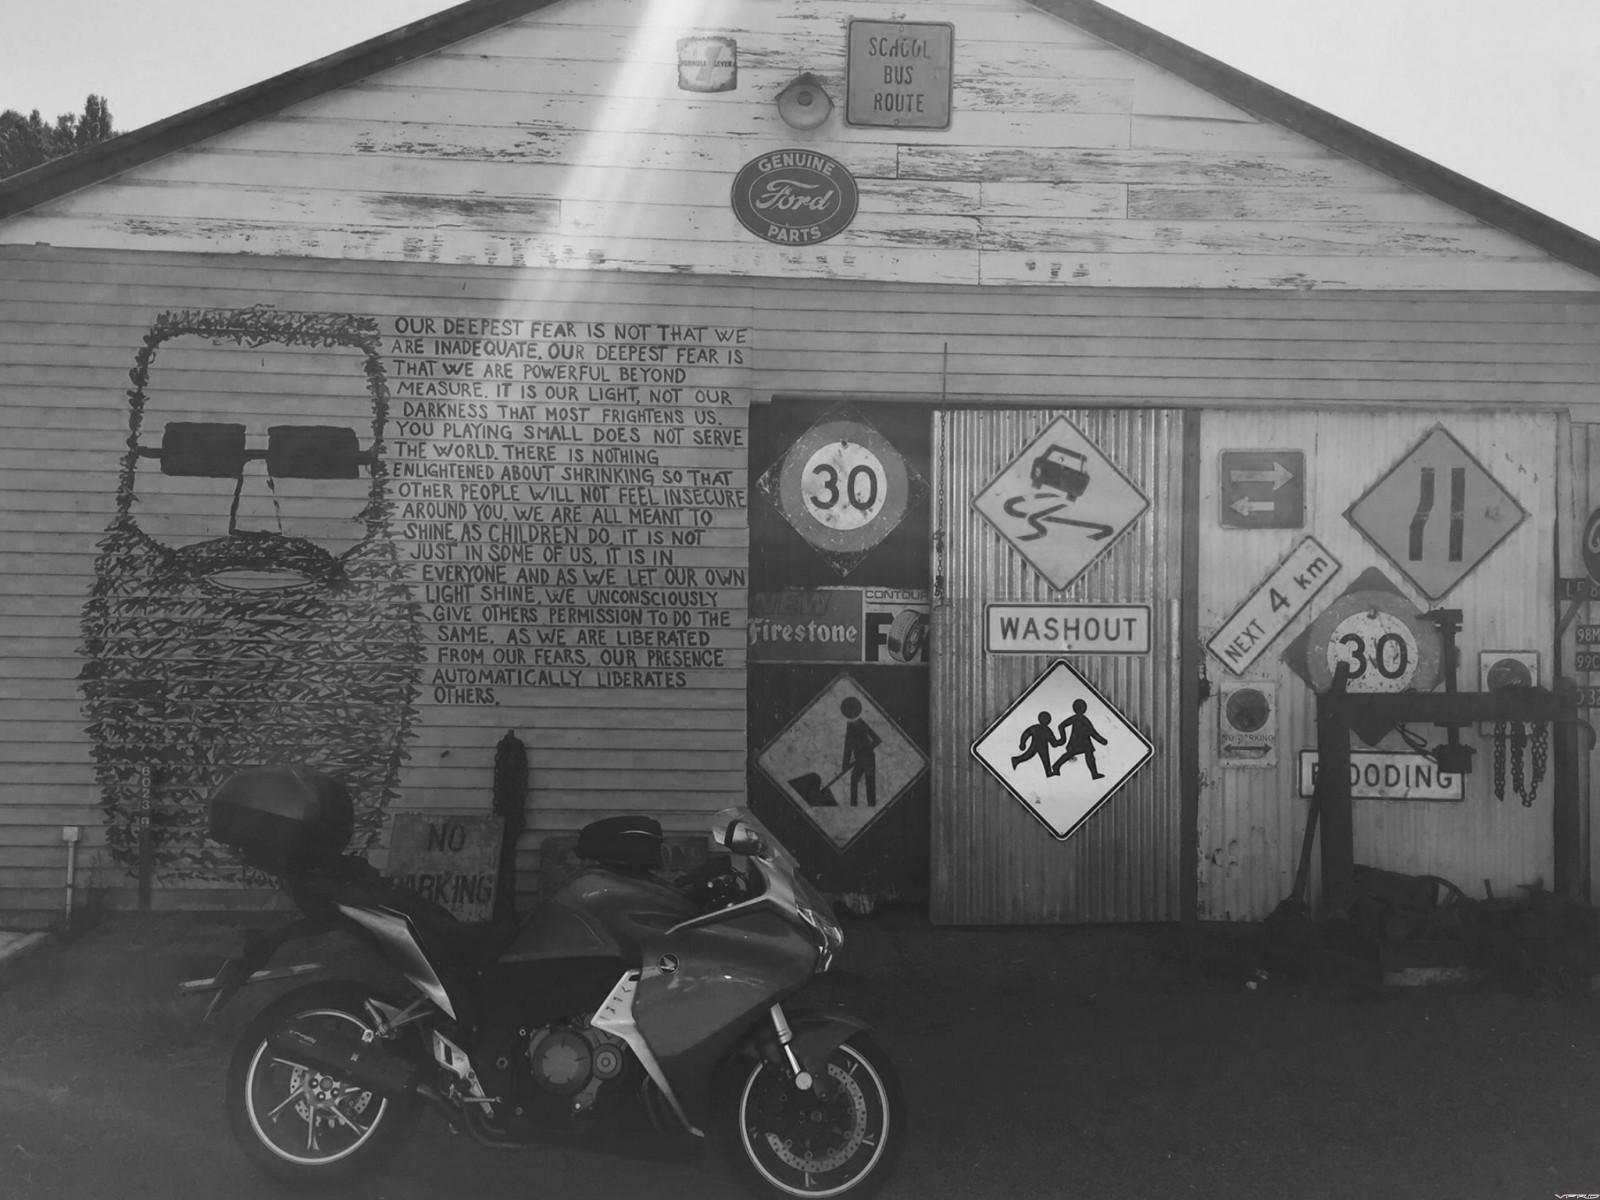 Forgotten Highway - Whangamomona Graffiti - unlikely ever to be a movie!